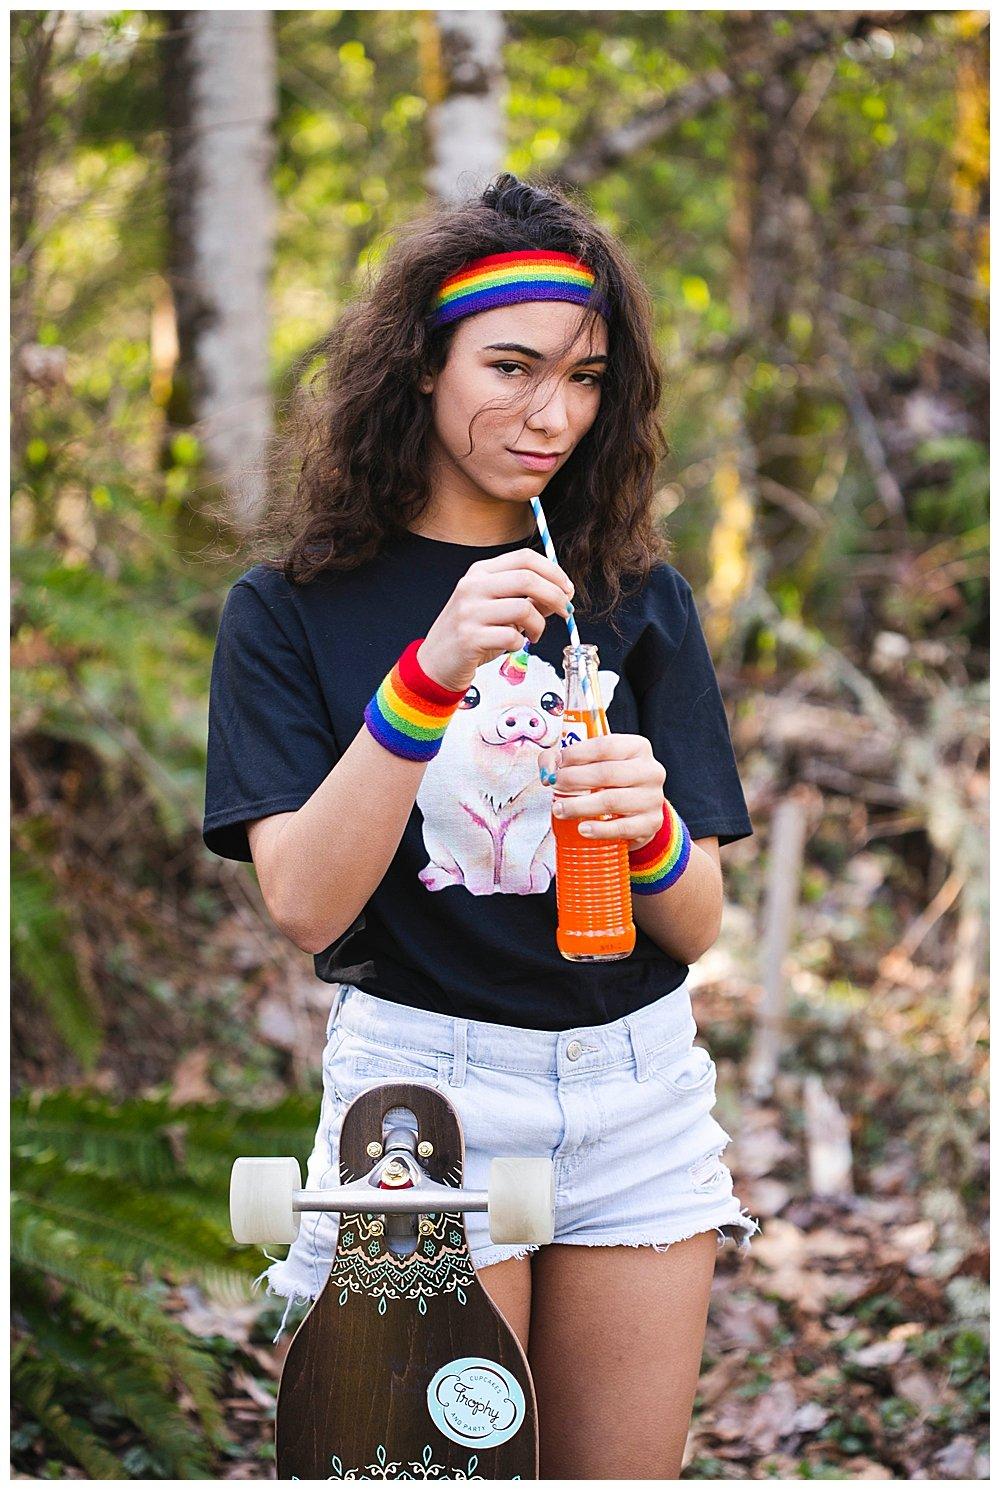 Rainbow Fanta girl in the woods.